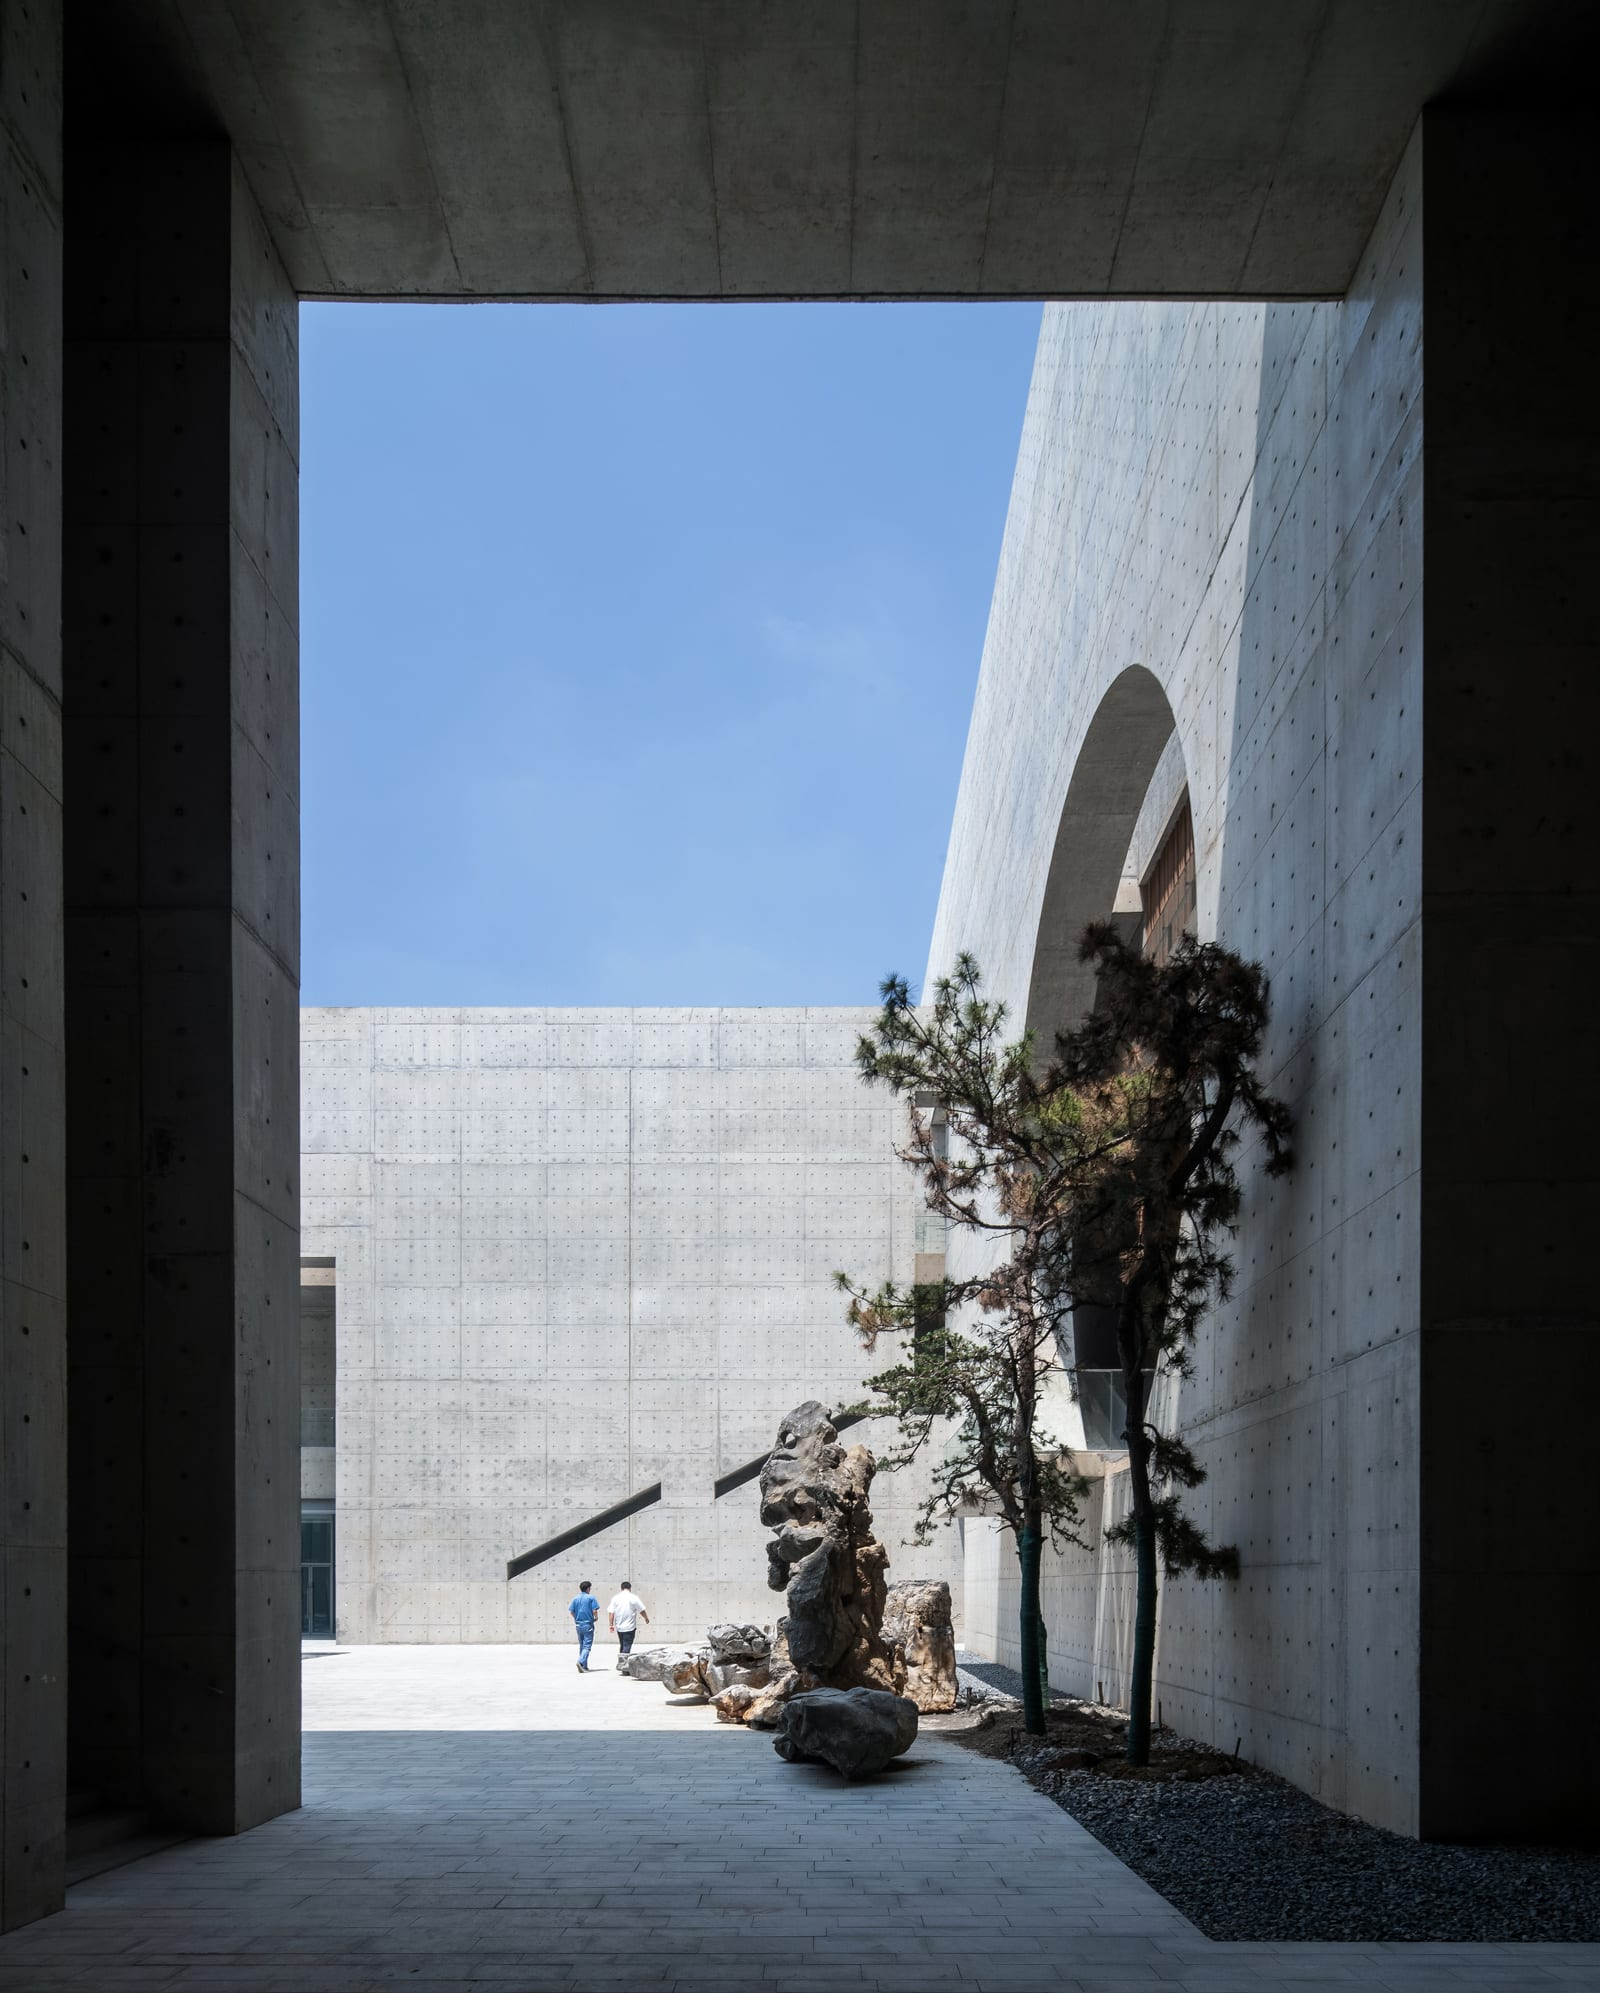 Shou County Culture and Art Center  - 20210702 Zhu Pei ShouCountyCultureArtCenter 04 37